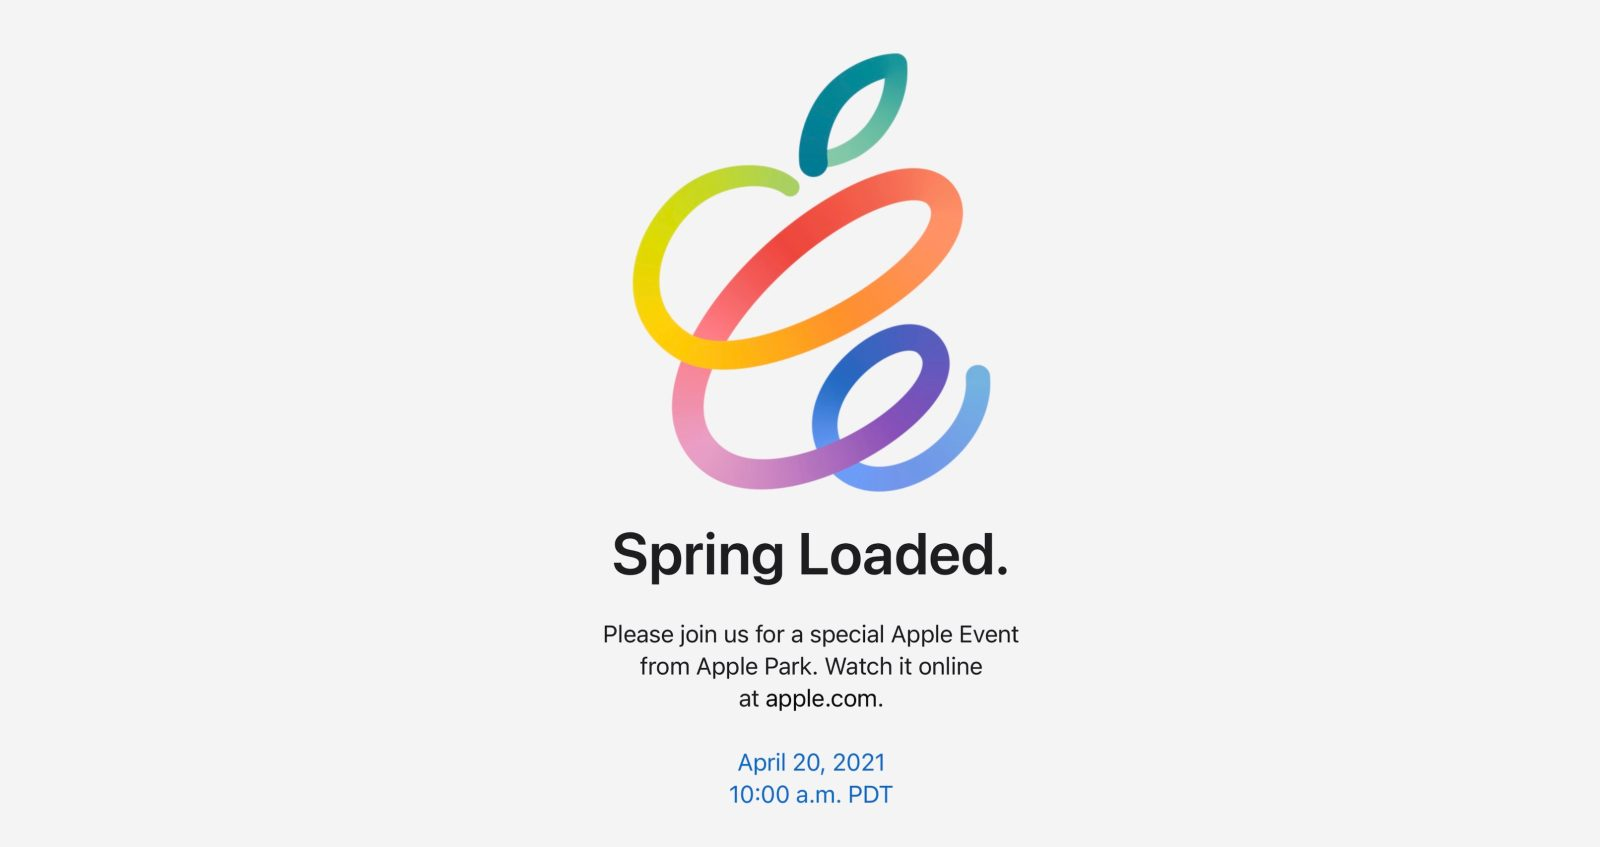 apple-spring-loaded-event-invite.jpg?qua